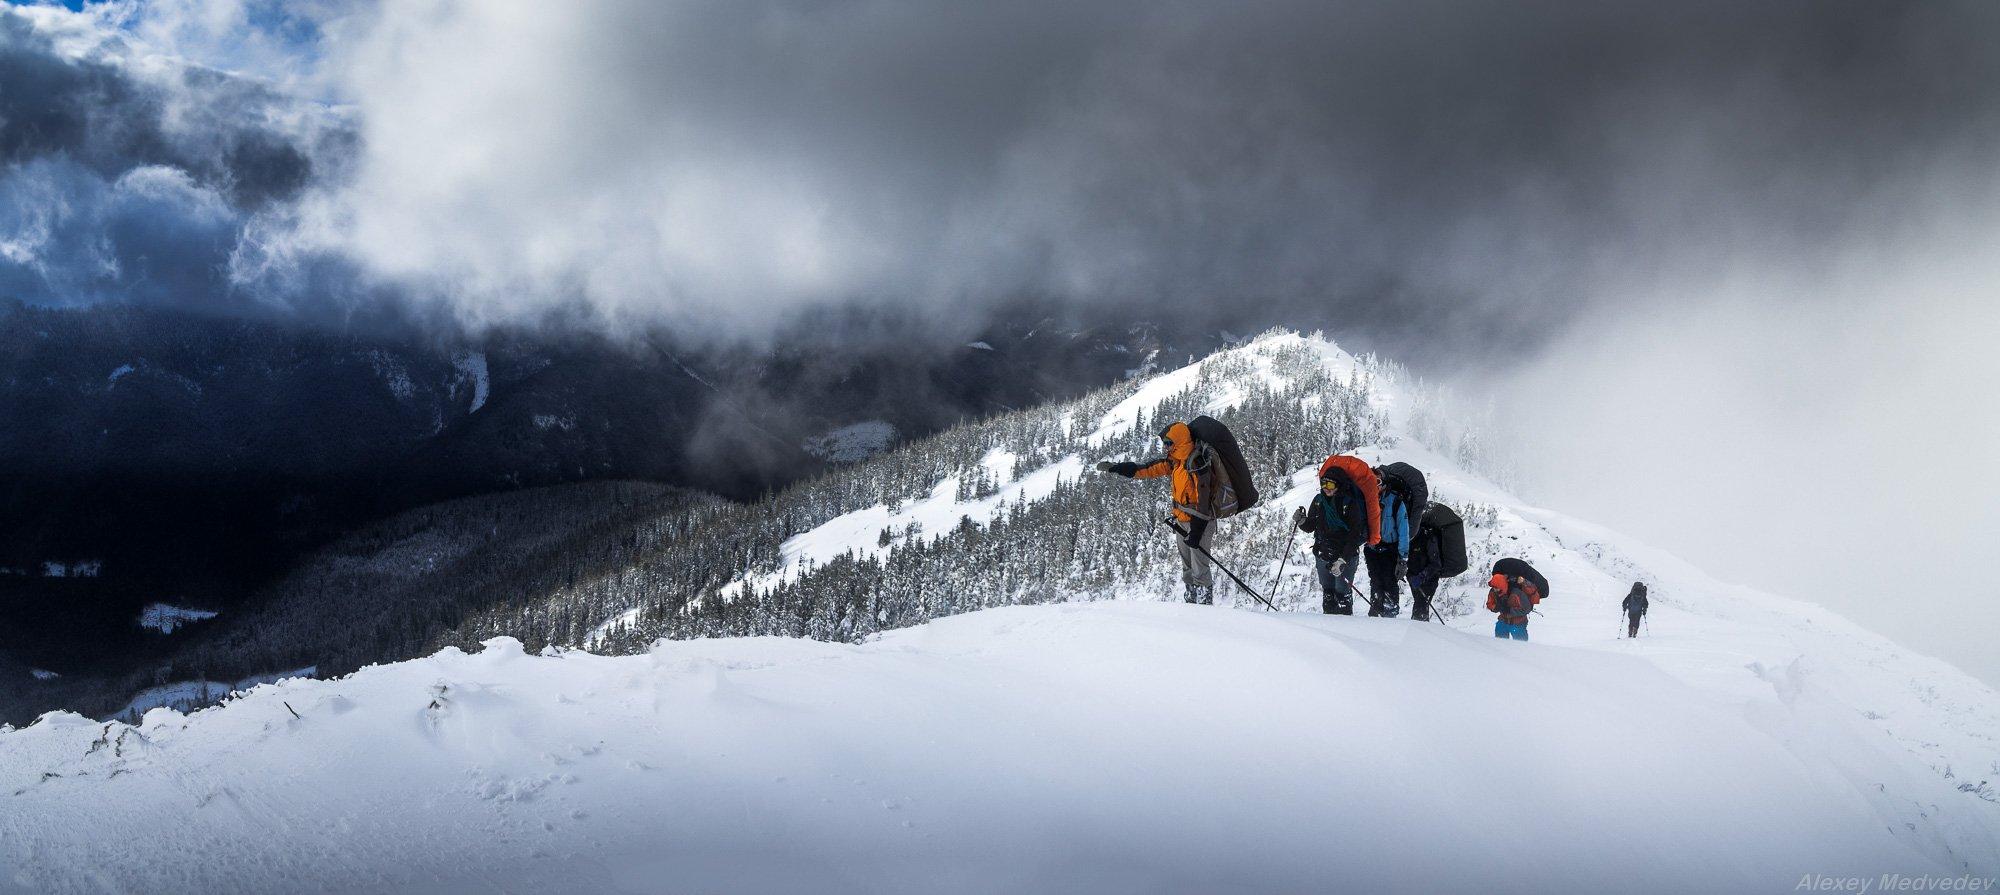 ukraine, man, hiker, carpathians, tourist,  mountains, people, один, одиночество, горы, зима, холод, Карпаты, сывули, горганы, Алексей Медведев